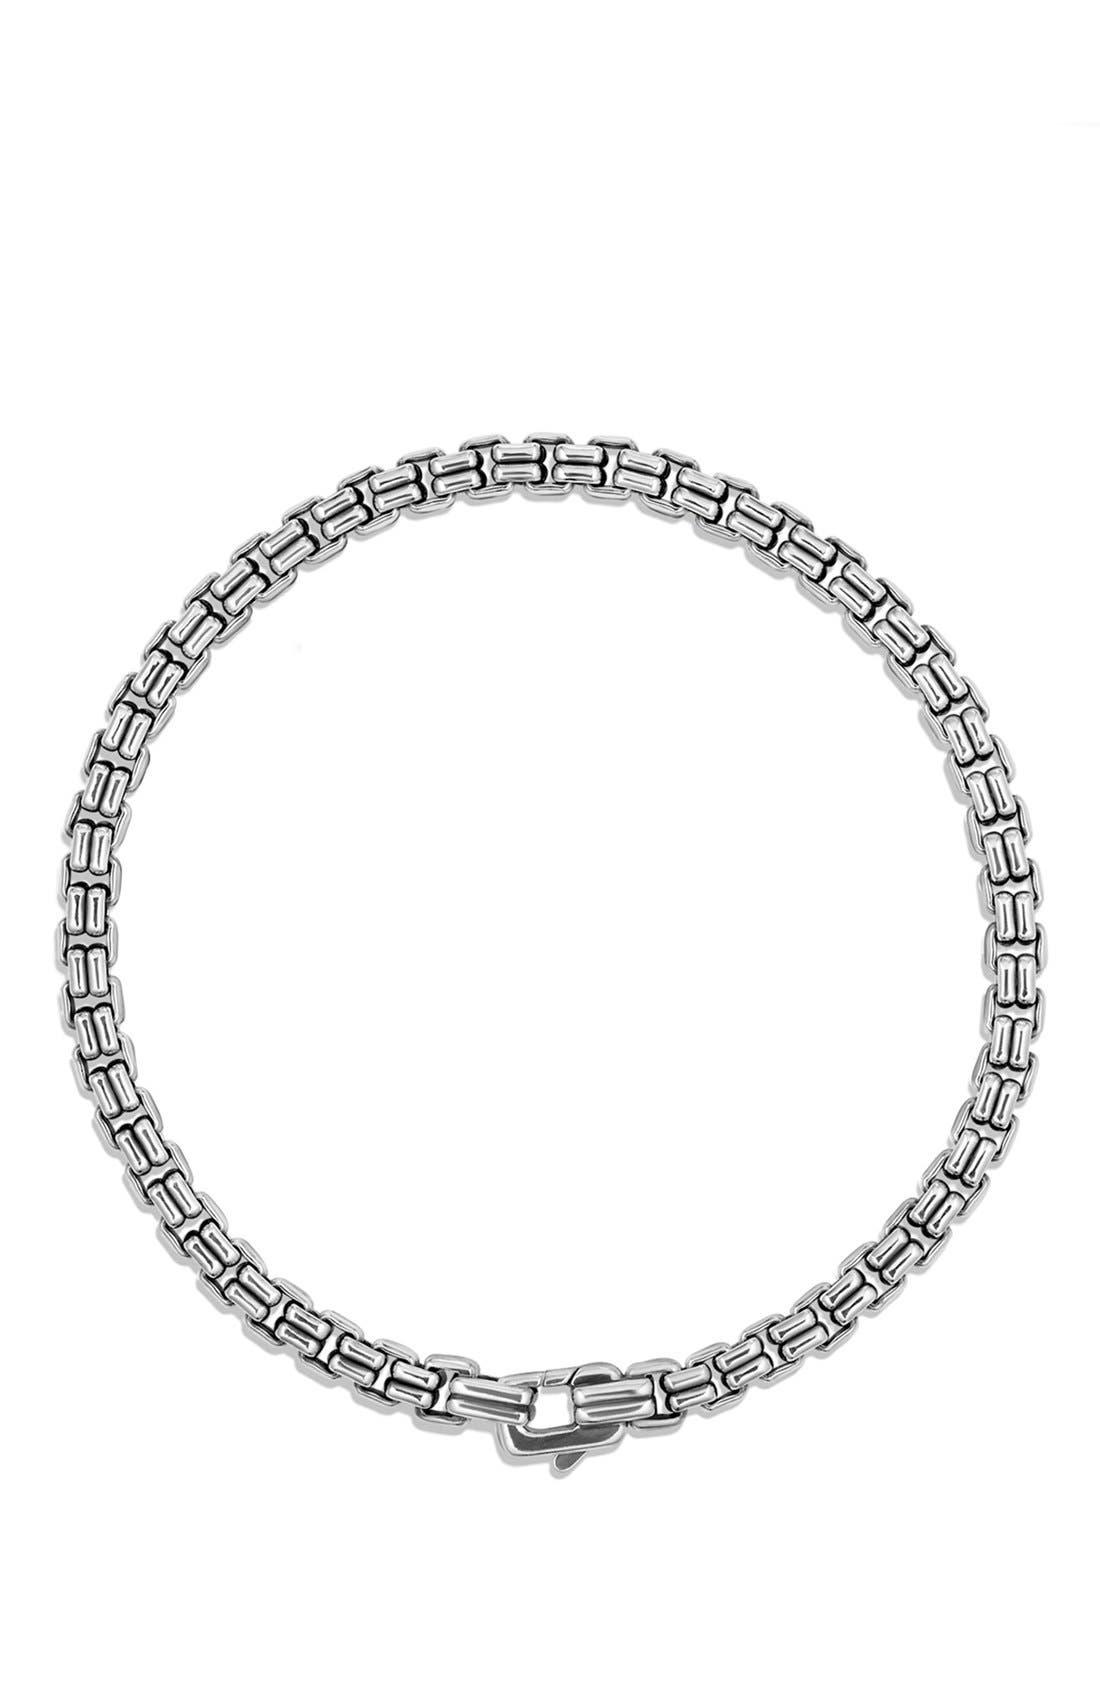 DAVID YURMAN,                             'Chain' Double Box Chain Bracelet,                             Alternate thumbnail 3, color,                             SILVER